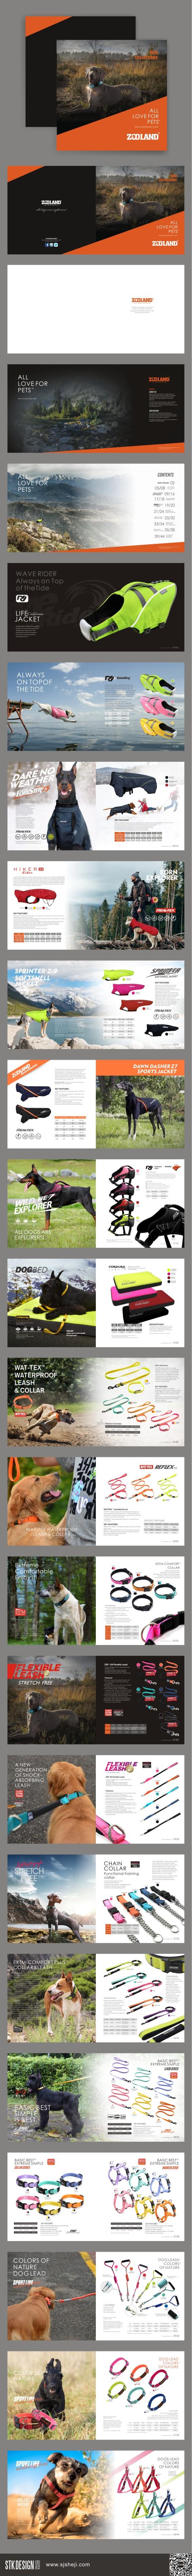 ZOOLAND宠物户外用品画册设计